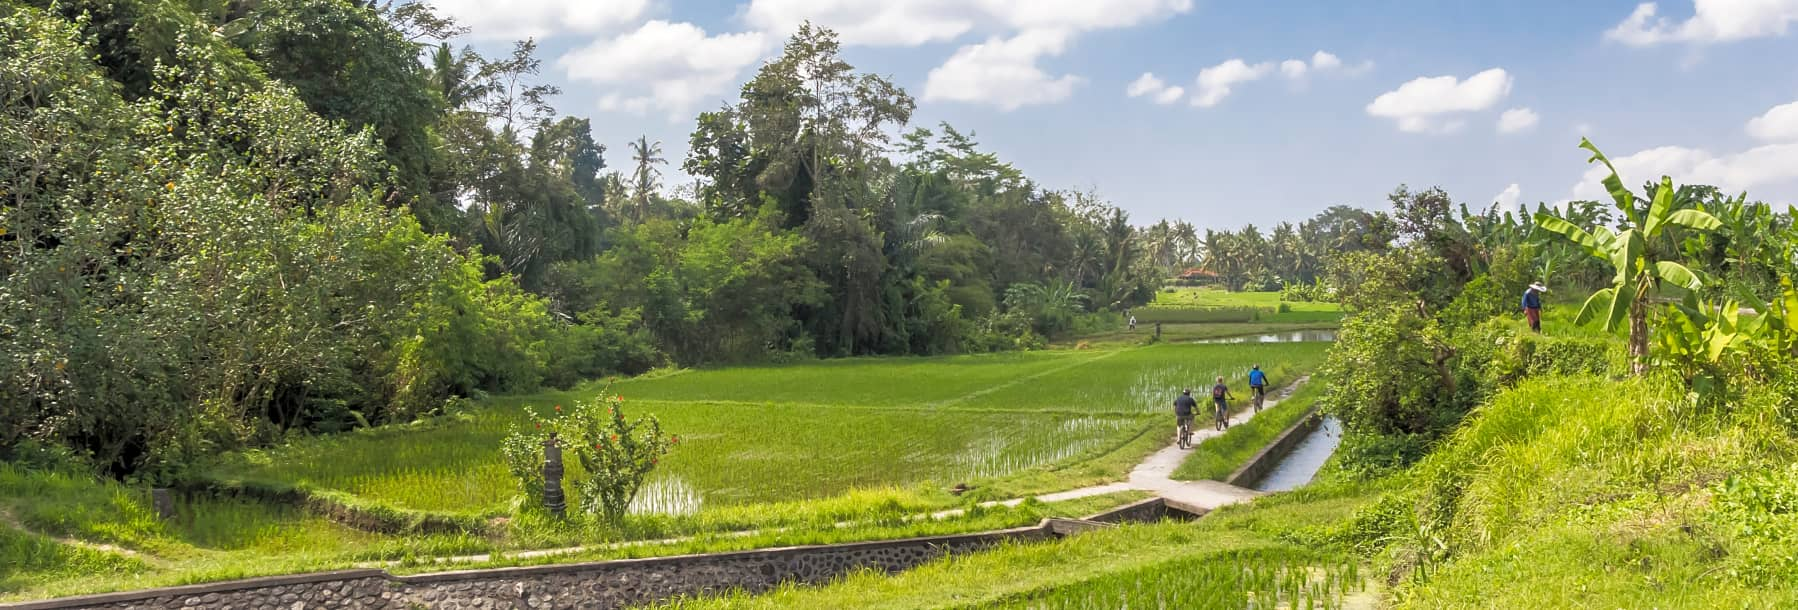 Jatiluwih Rice Terraces E Bike Tour (Bali) – Half Day gallery